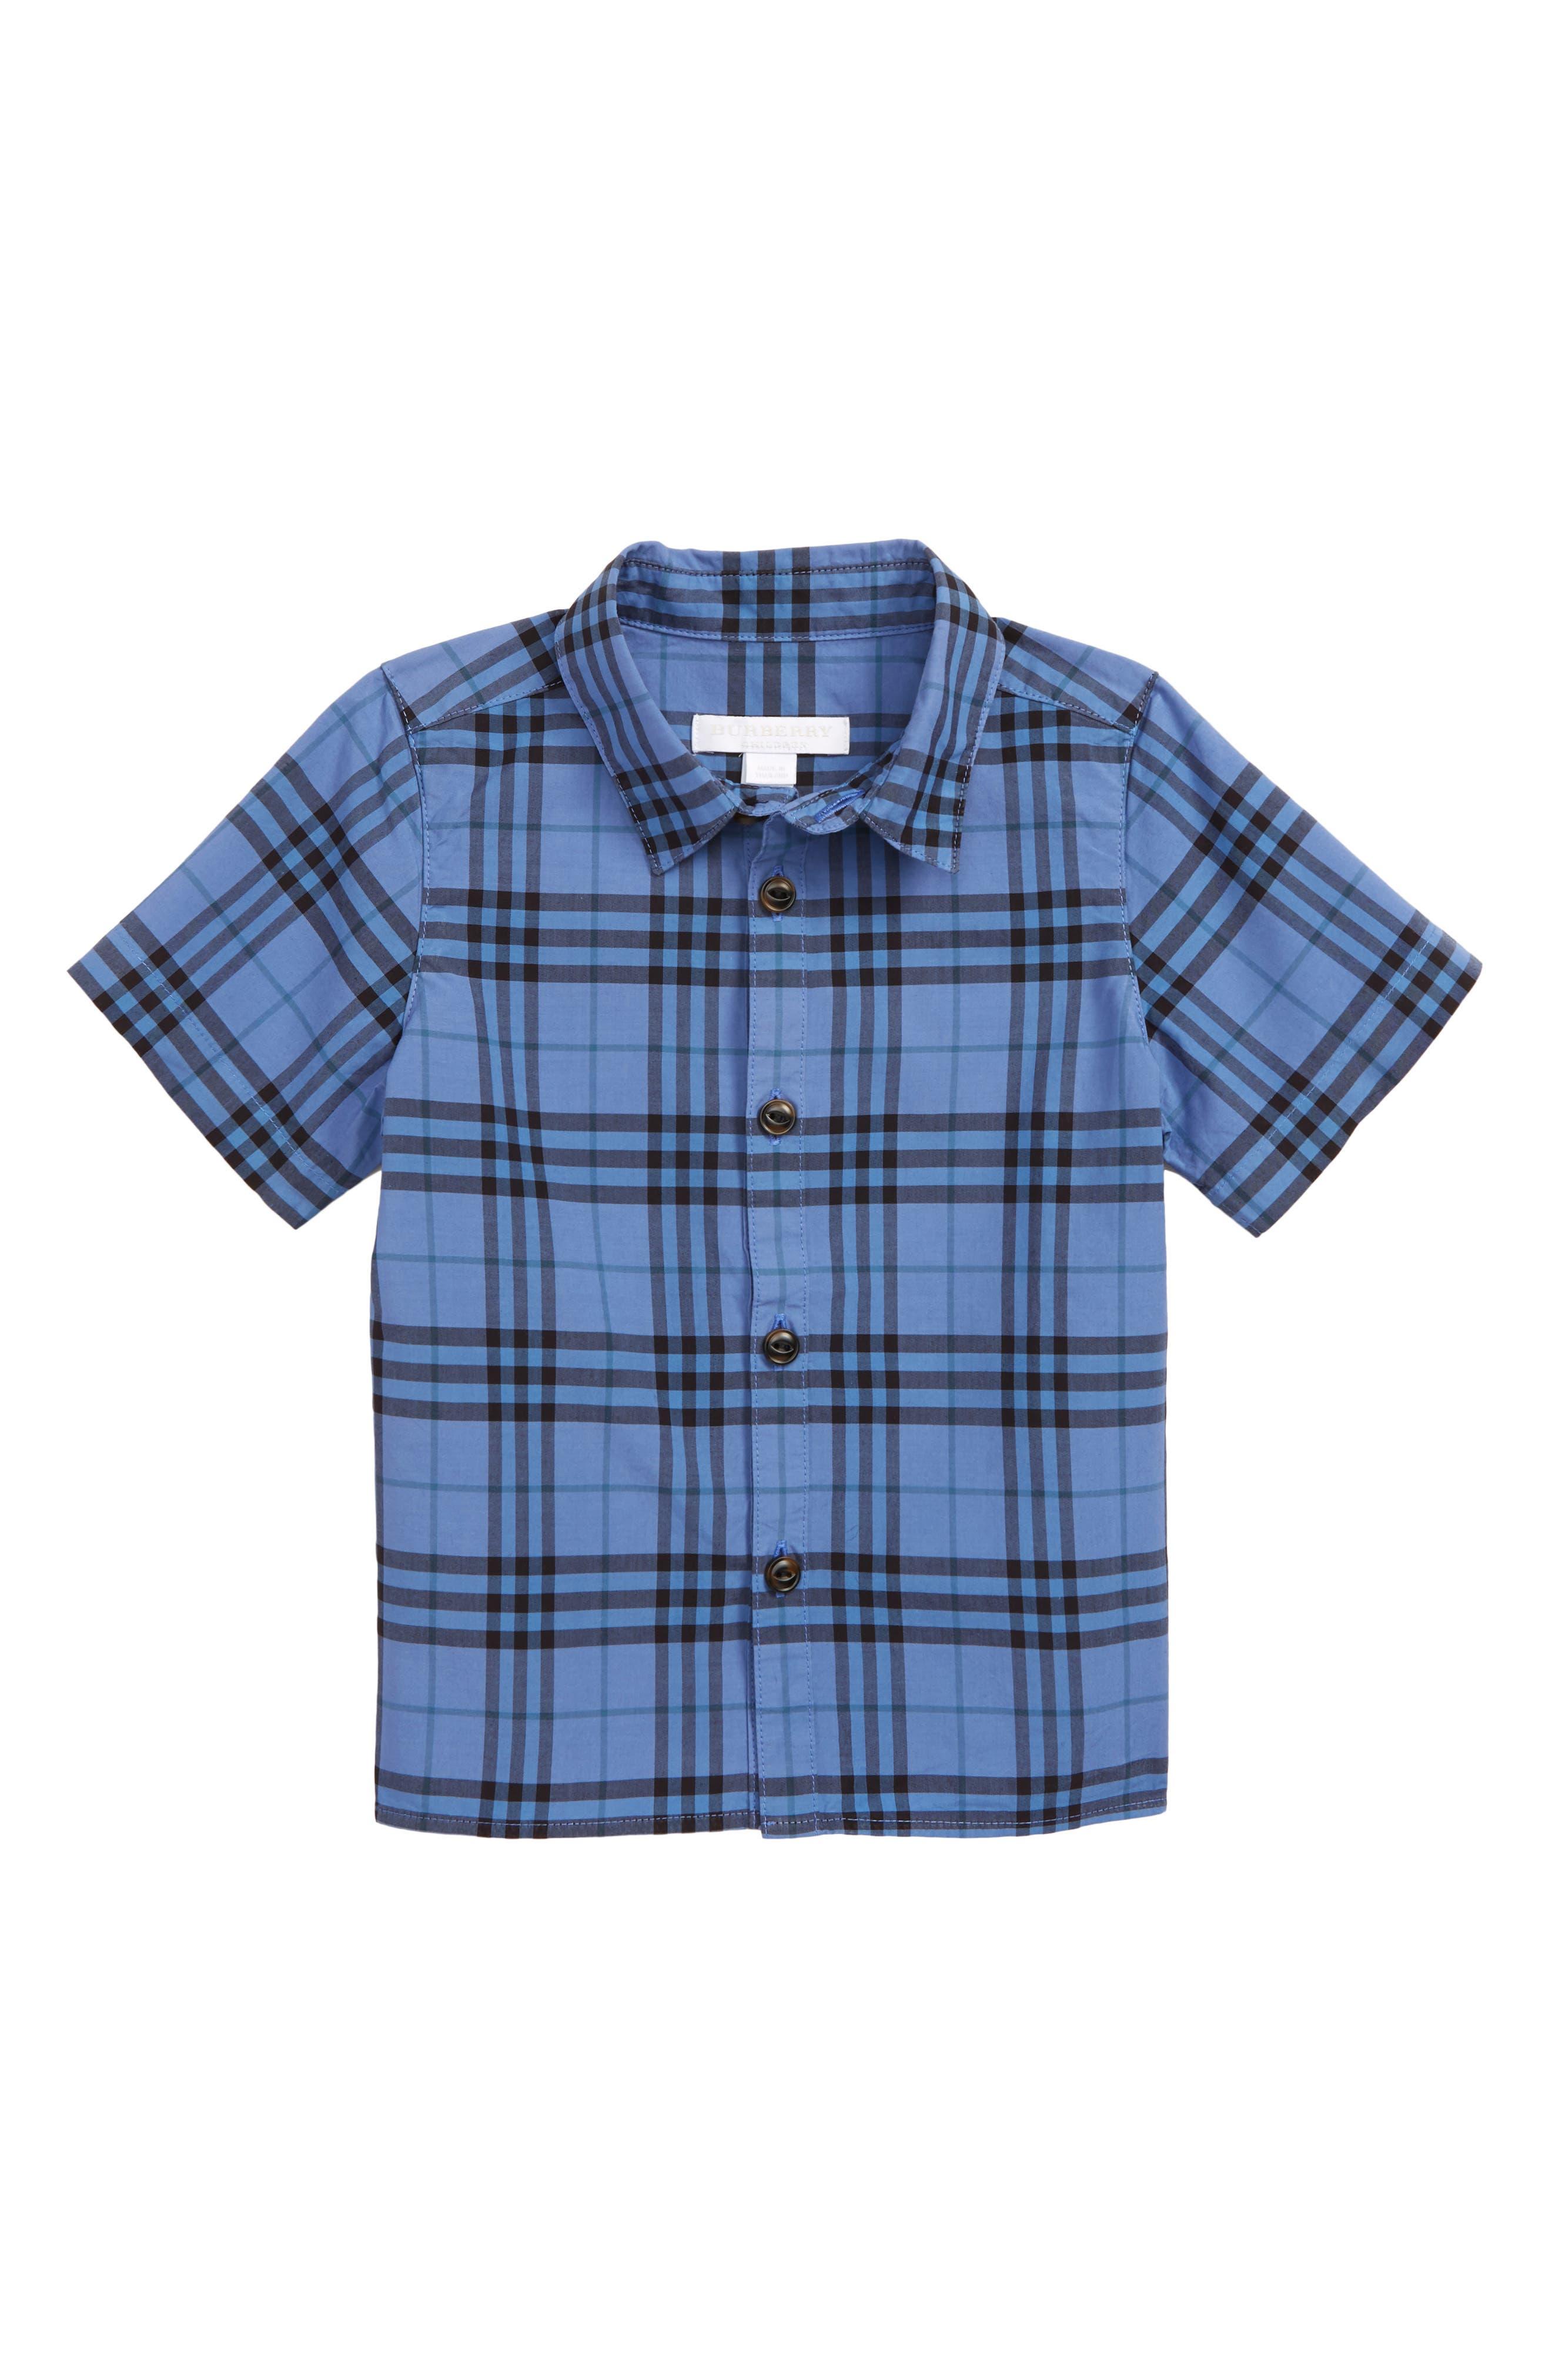 Sammi Dye Plaid Woven Shirt,                         Main,                         color, DUSTY BLUE